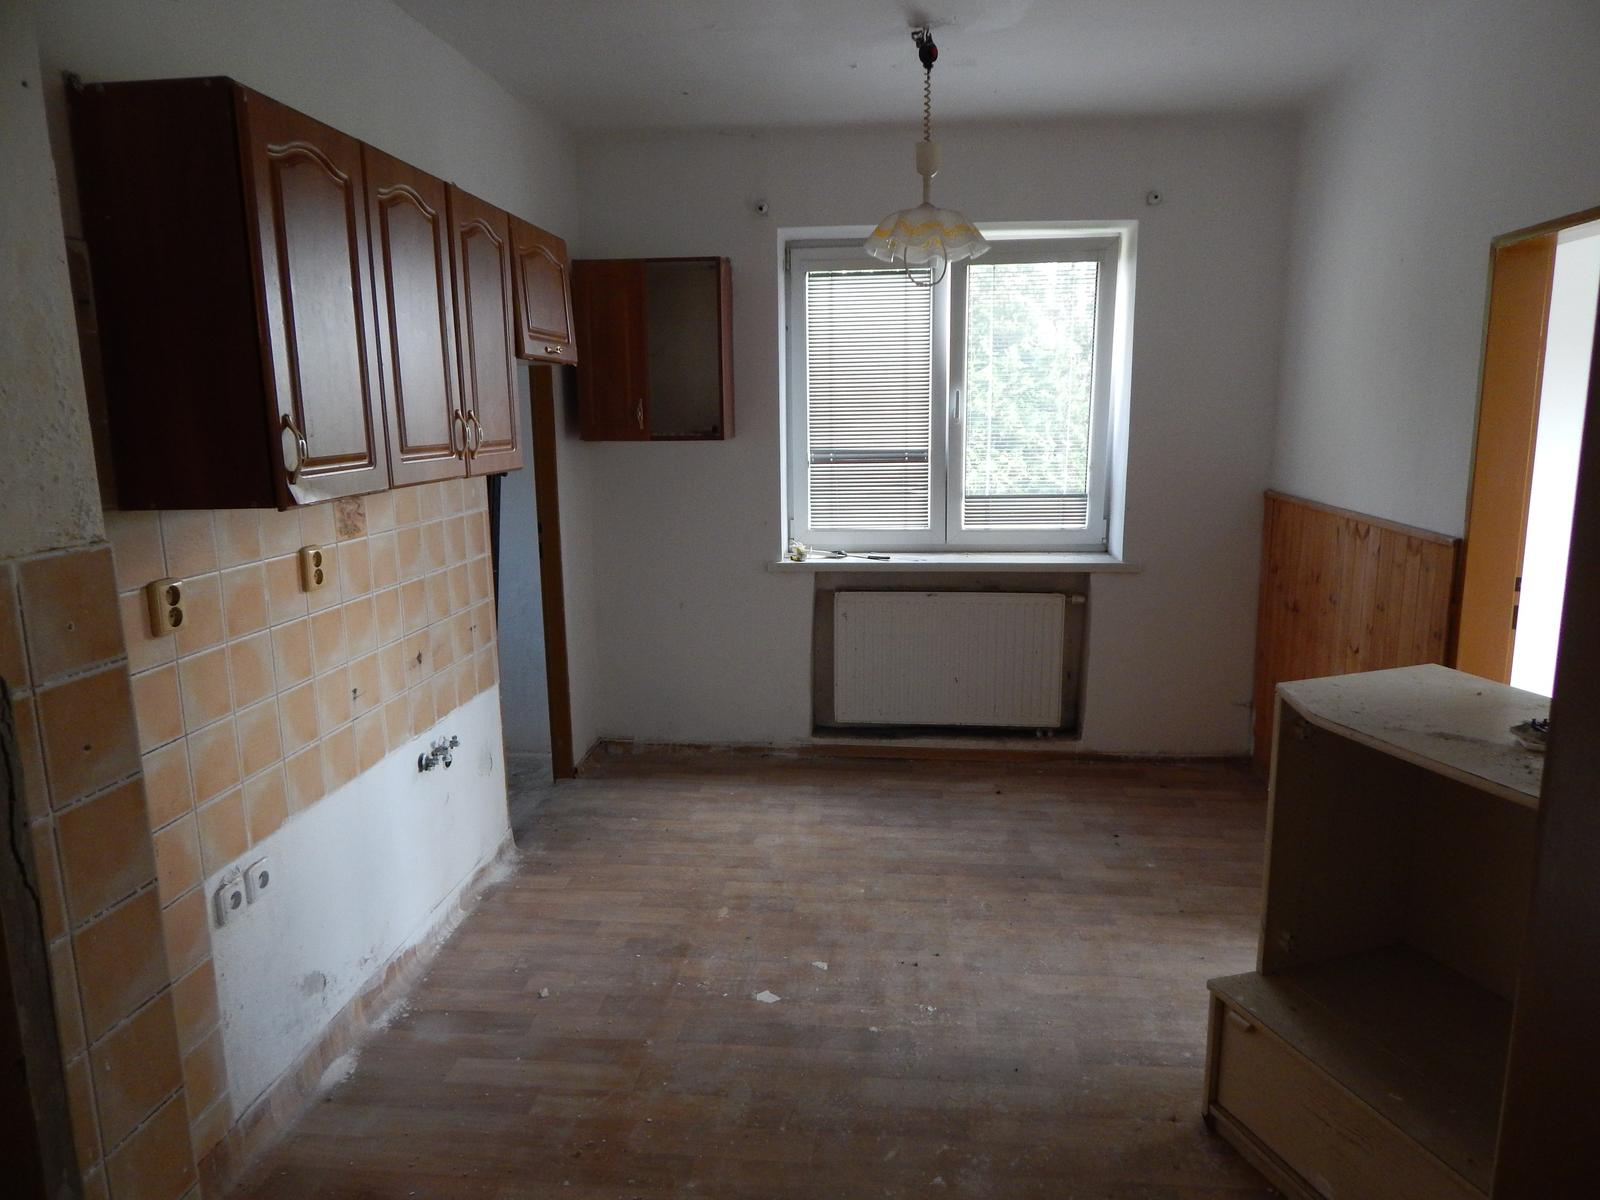 Náš nový domov ... - Obrázek č. 5